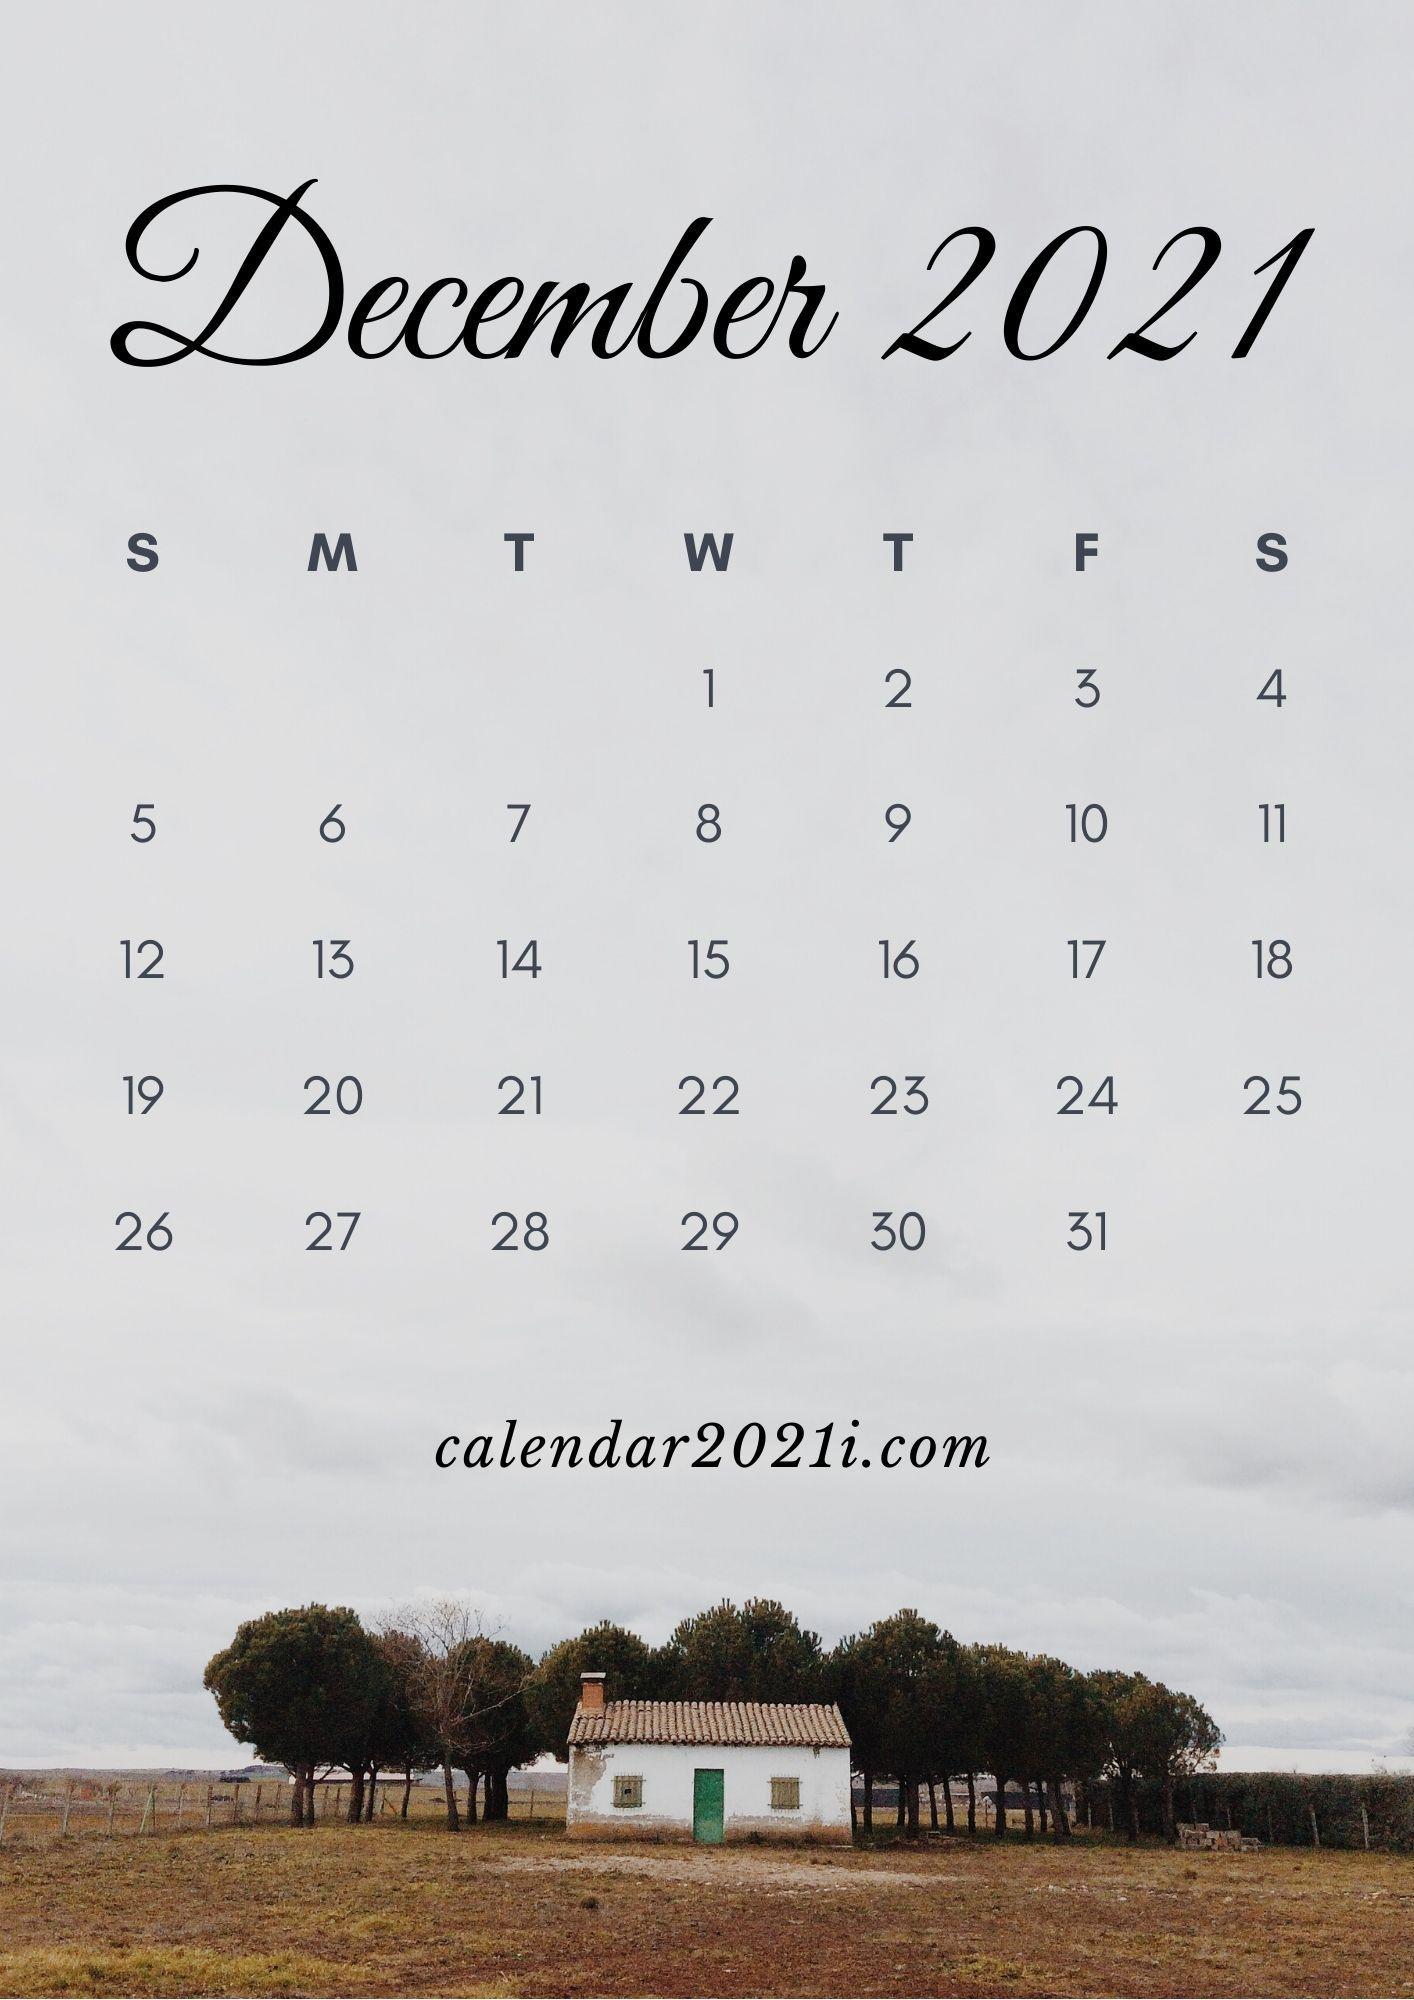 Pin on 2021 Calendars 1414x2000